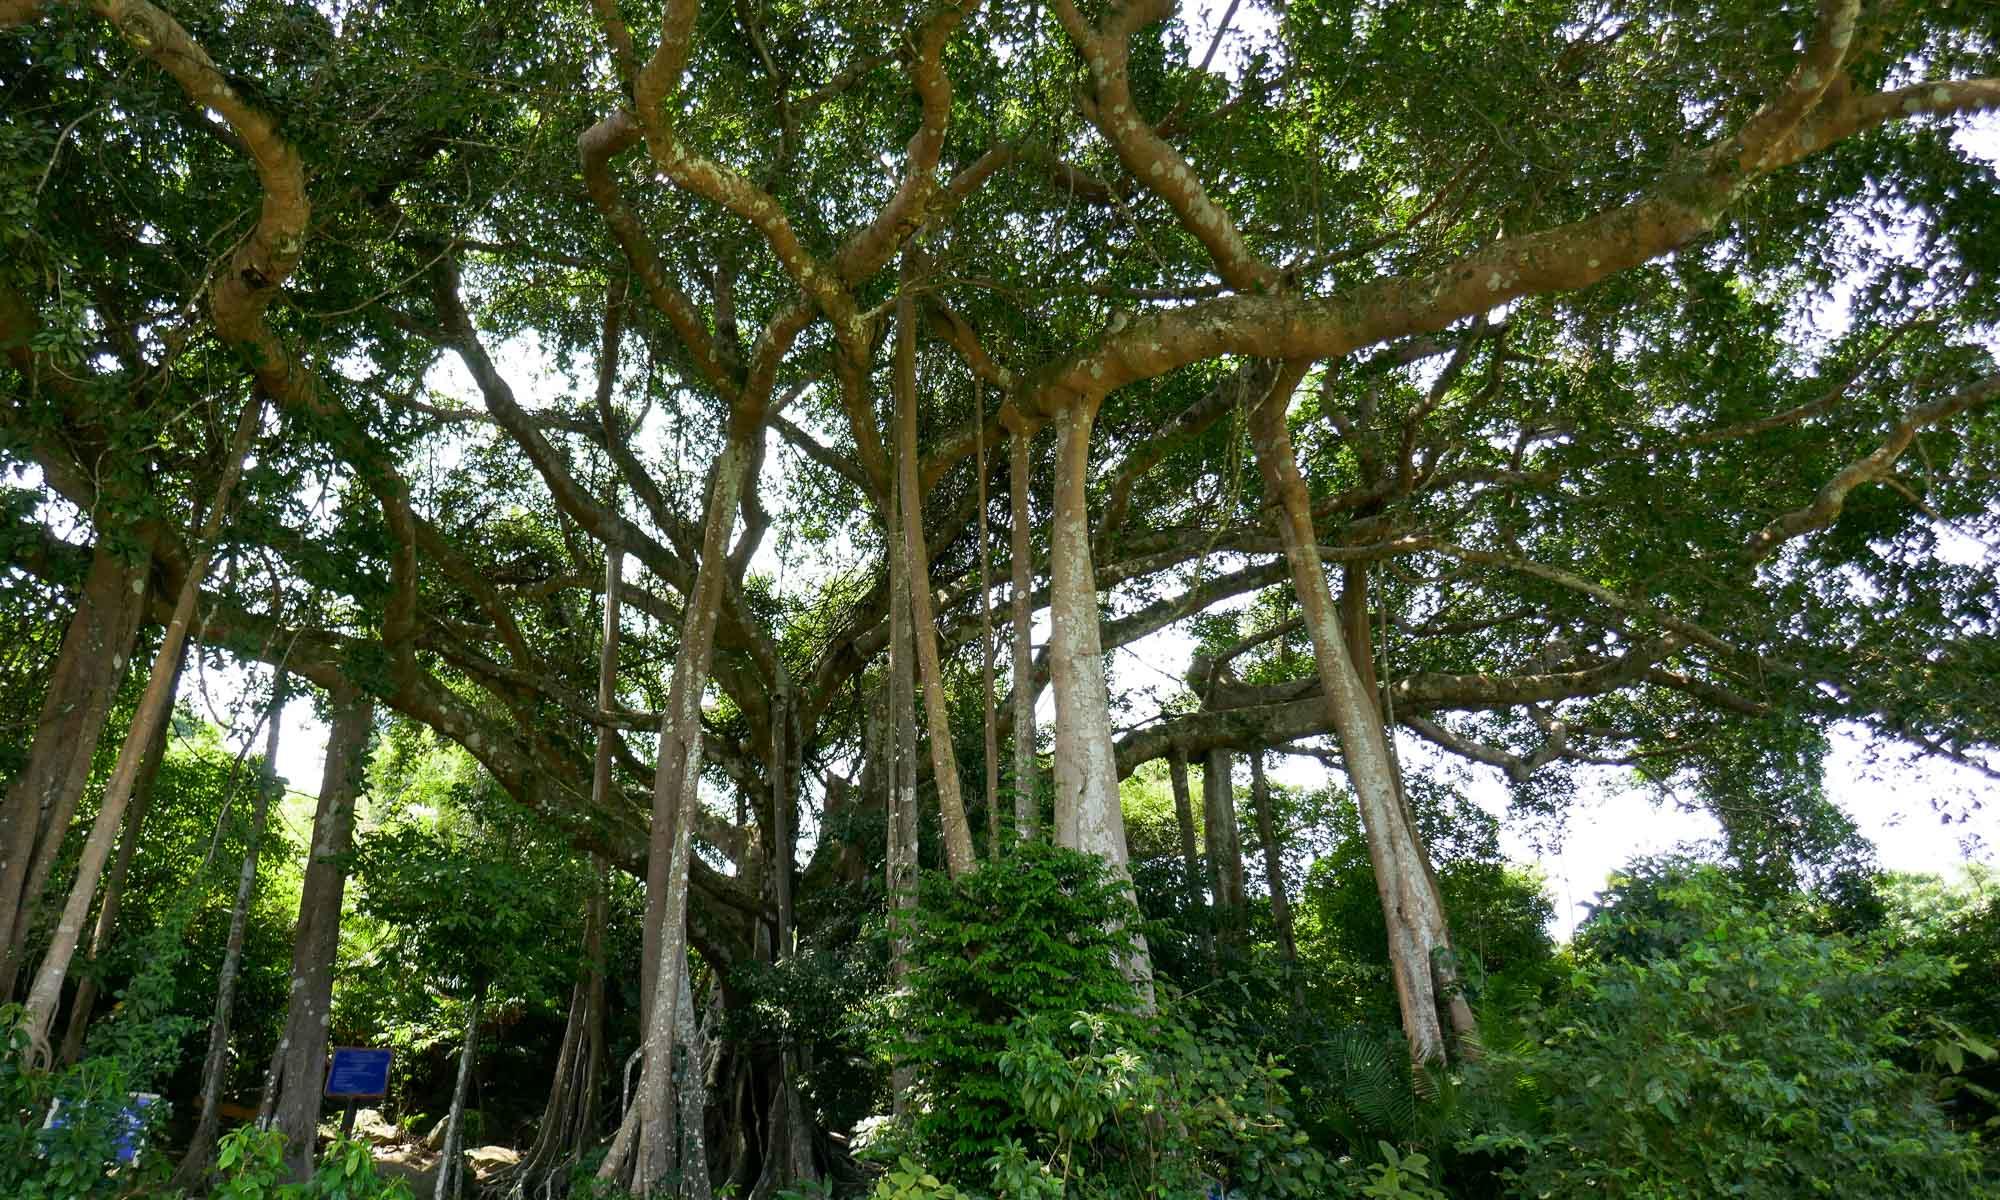 The 1,000 year old banyan tree